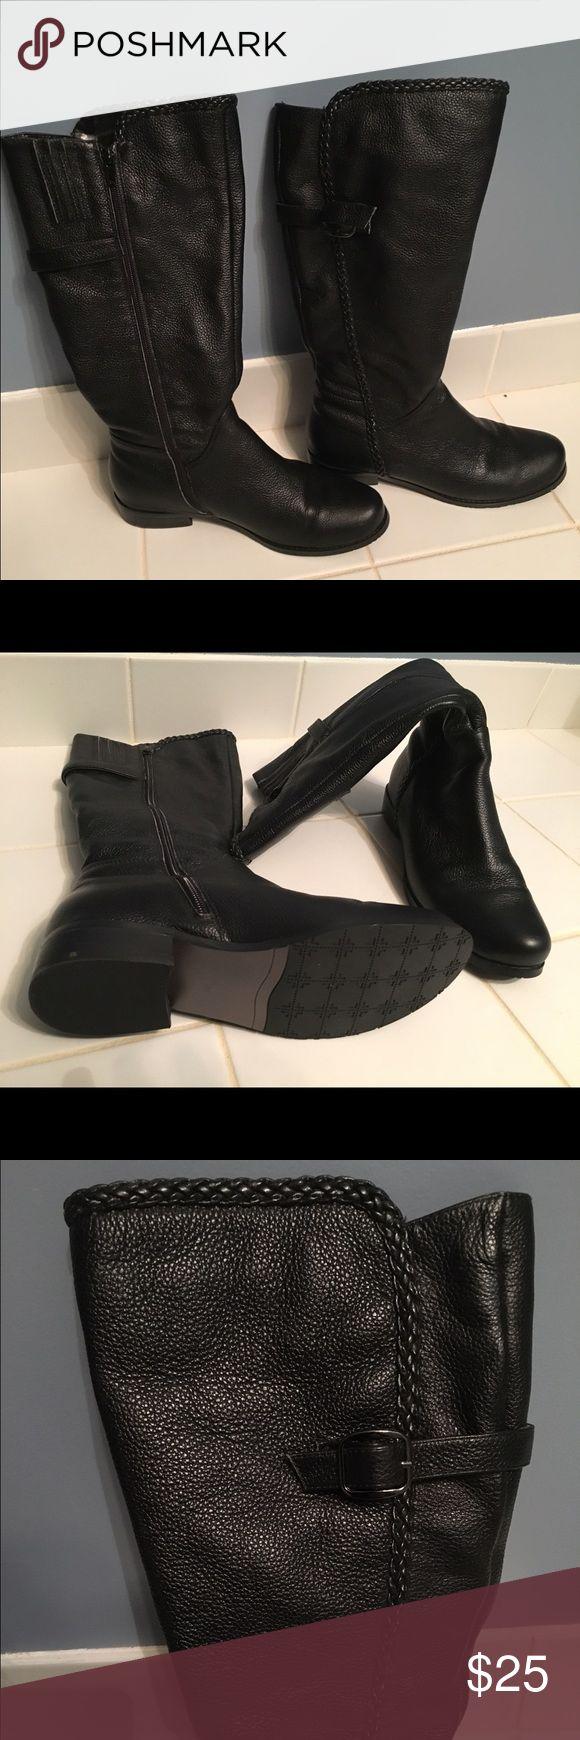 Gabriella Rocha Boots Gabriella Rocha boots. Black, Size 7.5  never worn. gabriella rocha Shoes Heeled Boots